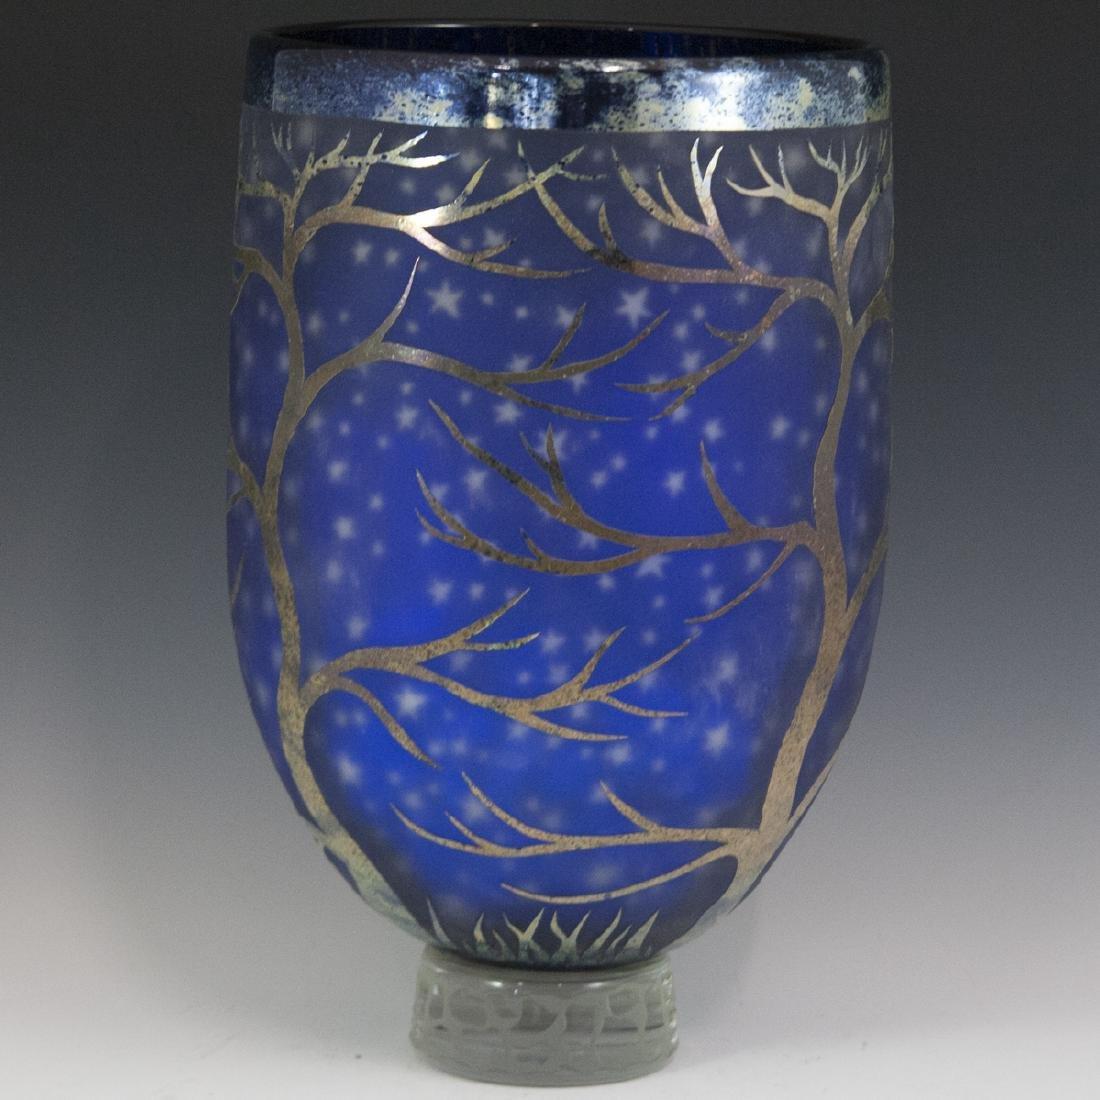 Large Duncan McClellan Art Glass Vase - 5